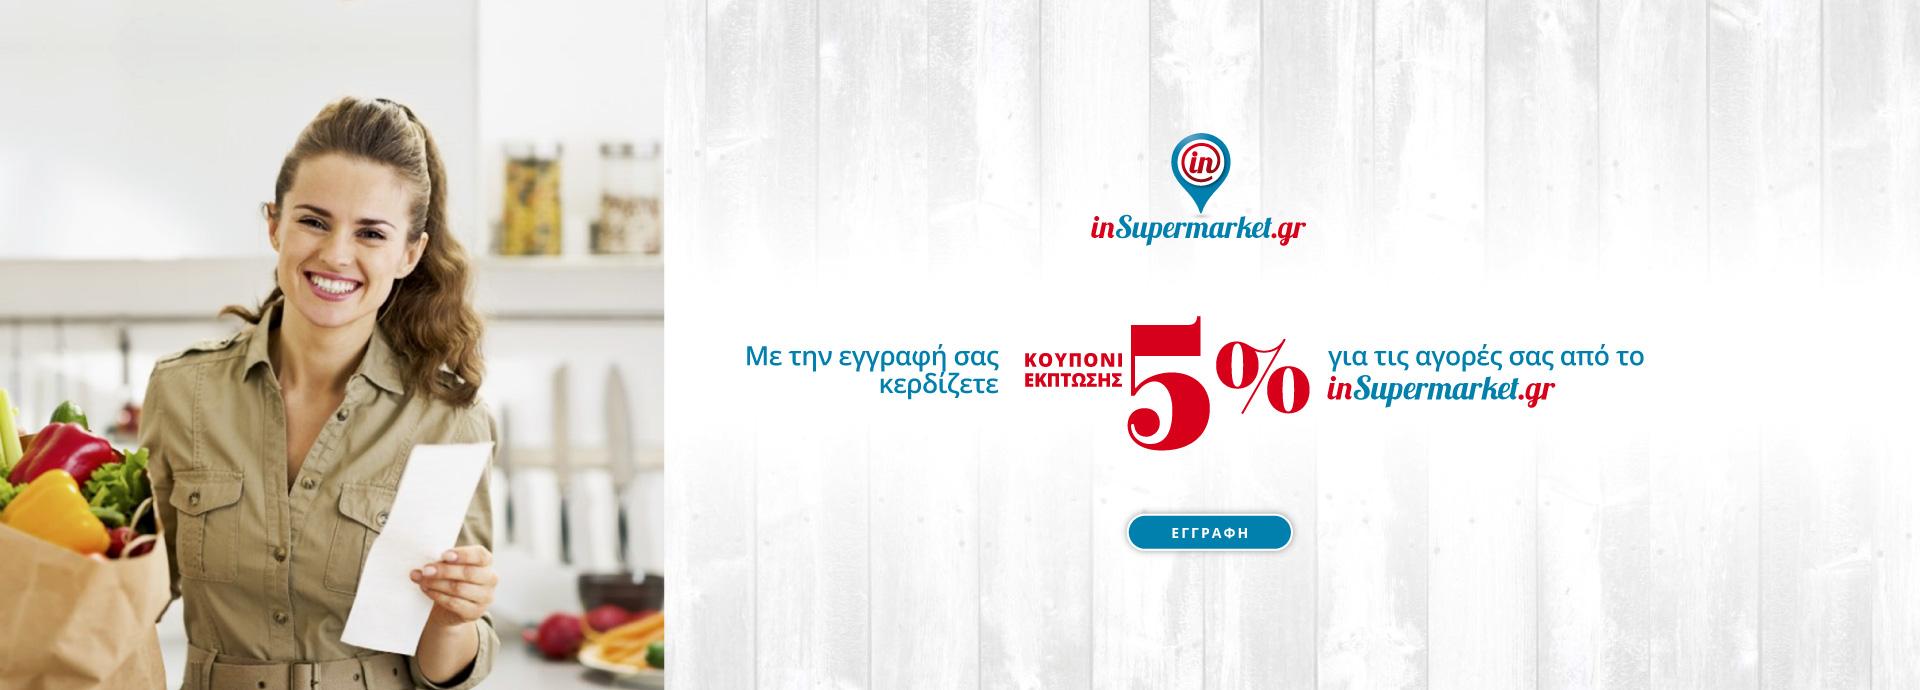 super market θεσσαλονικη